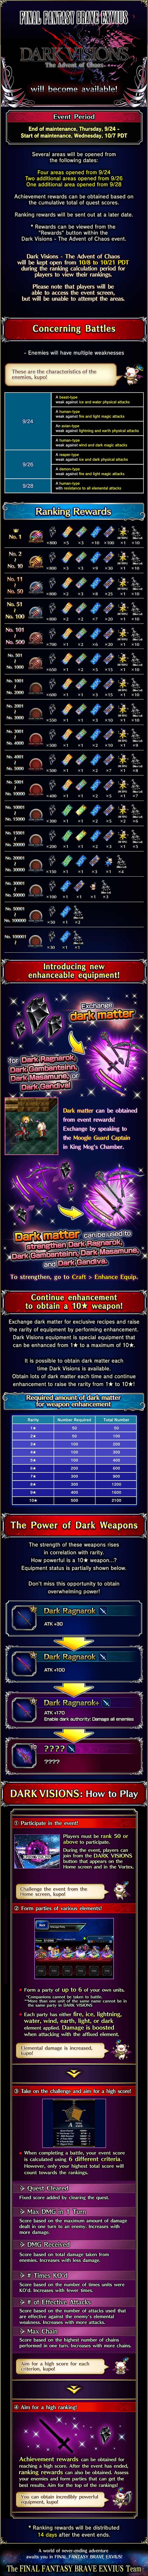 Dark Visions (Visions Obscures) 6 - du 24/09 au 08/10/20 20200922DarkVisions6